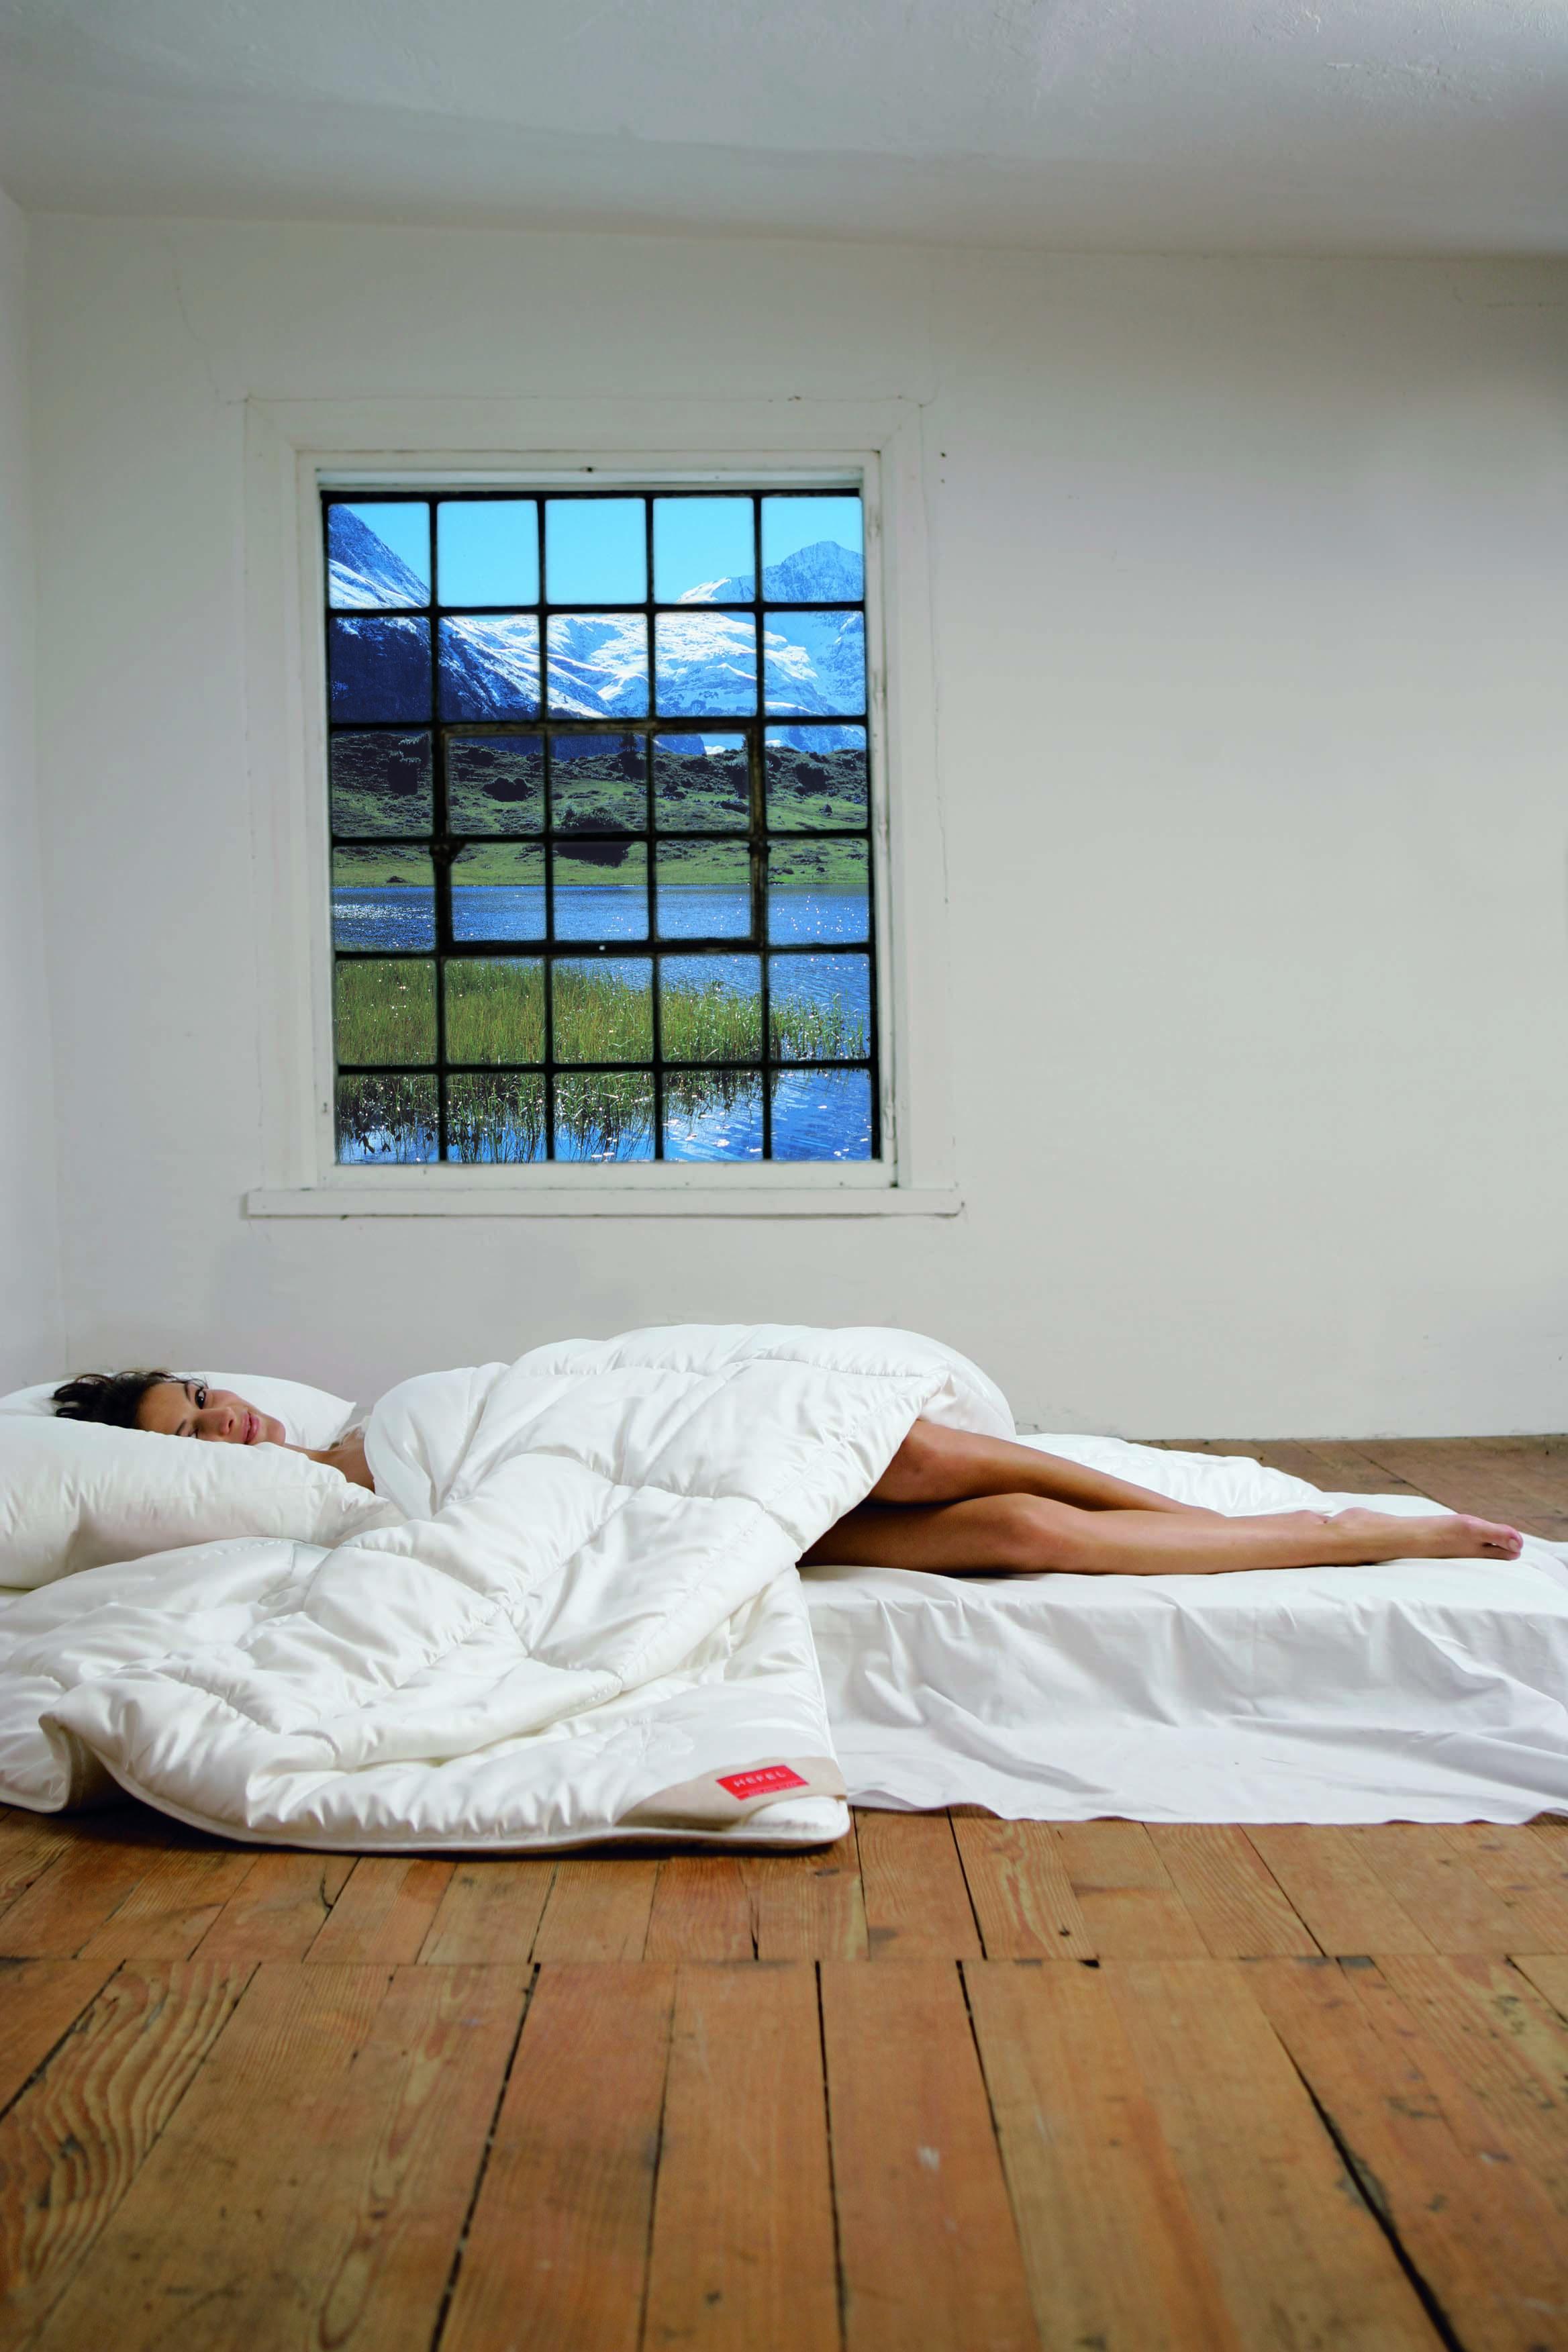 hefel clima control comfort kissen 40x80 und 80x80 wasserbetten markenshop. Black Bedroom Furniture Sets. Home Design Ideas